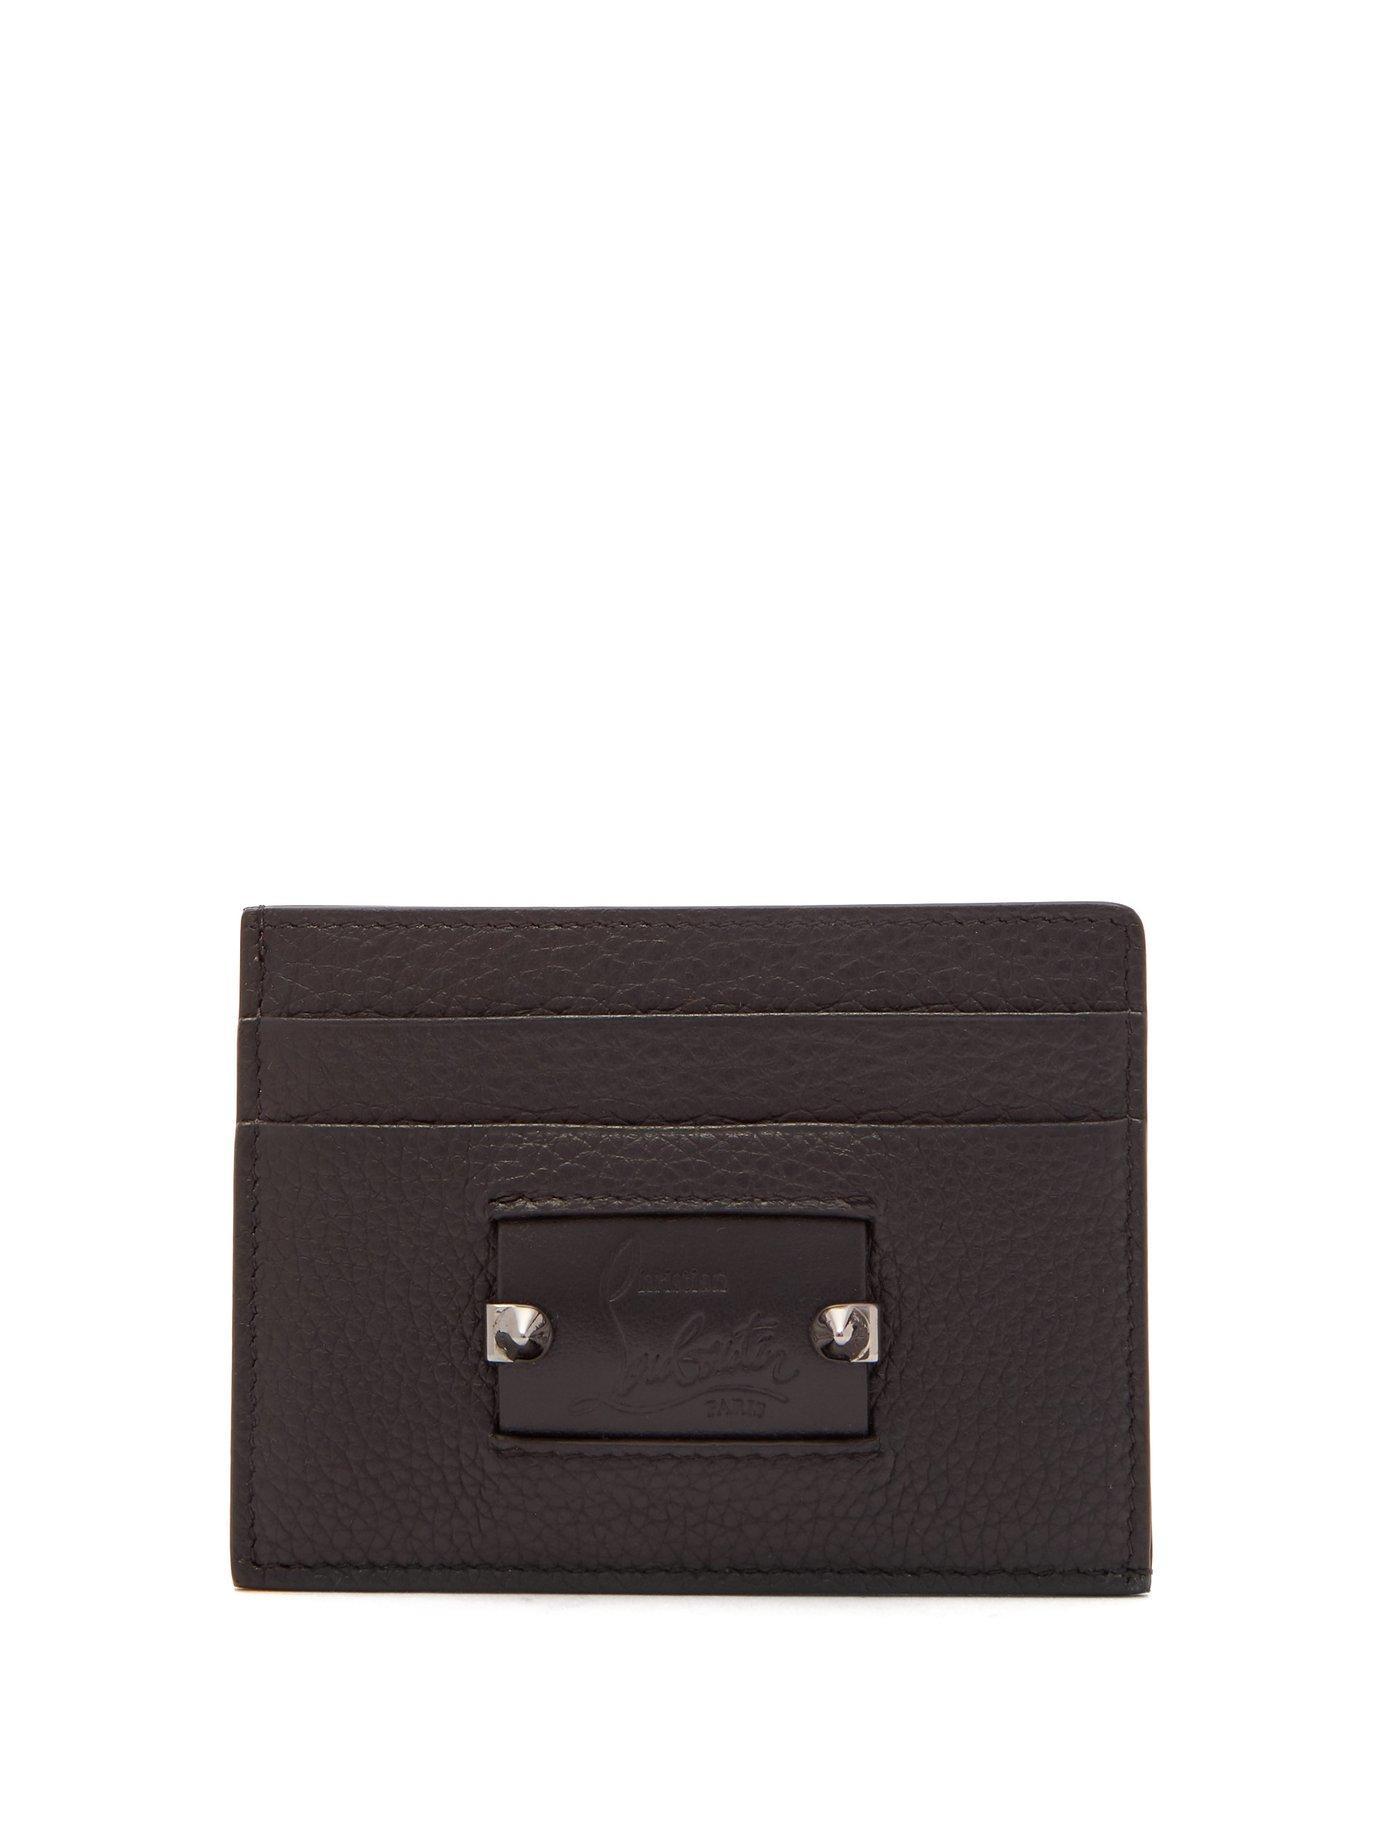 3dcd84b148e Lyst - Christian Louboutin Kios Spike Leather Cardholder in Black ...